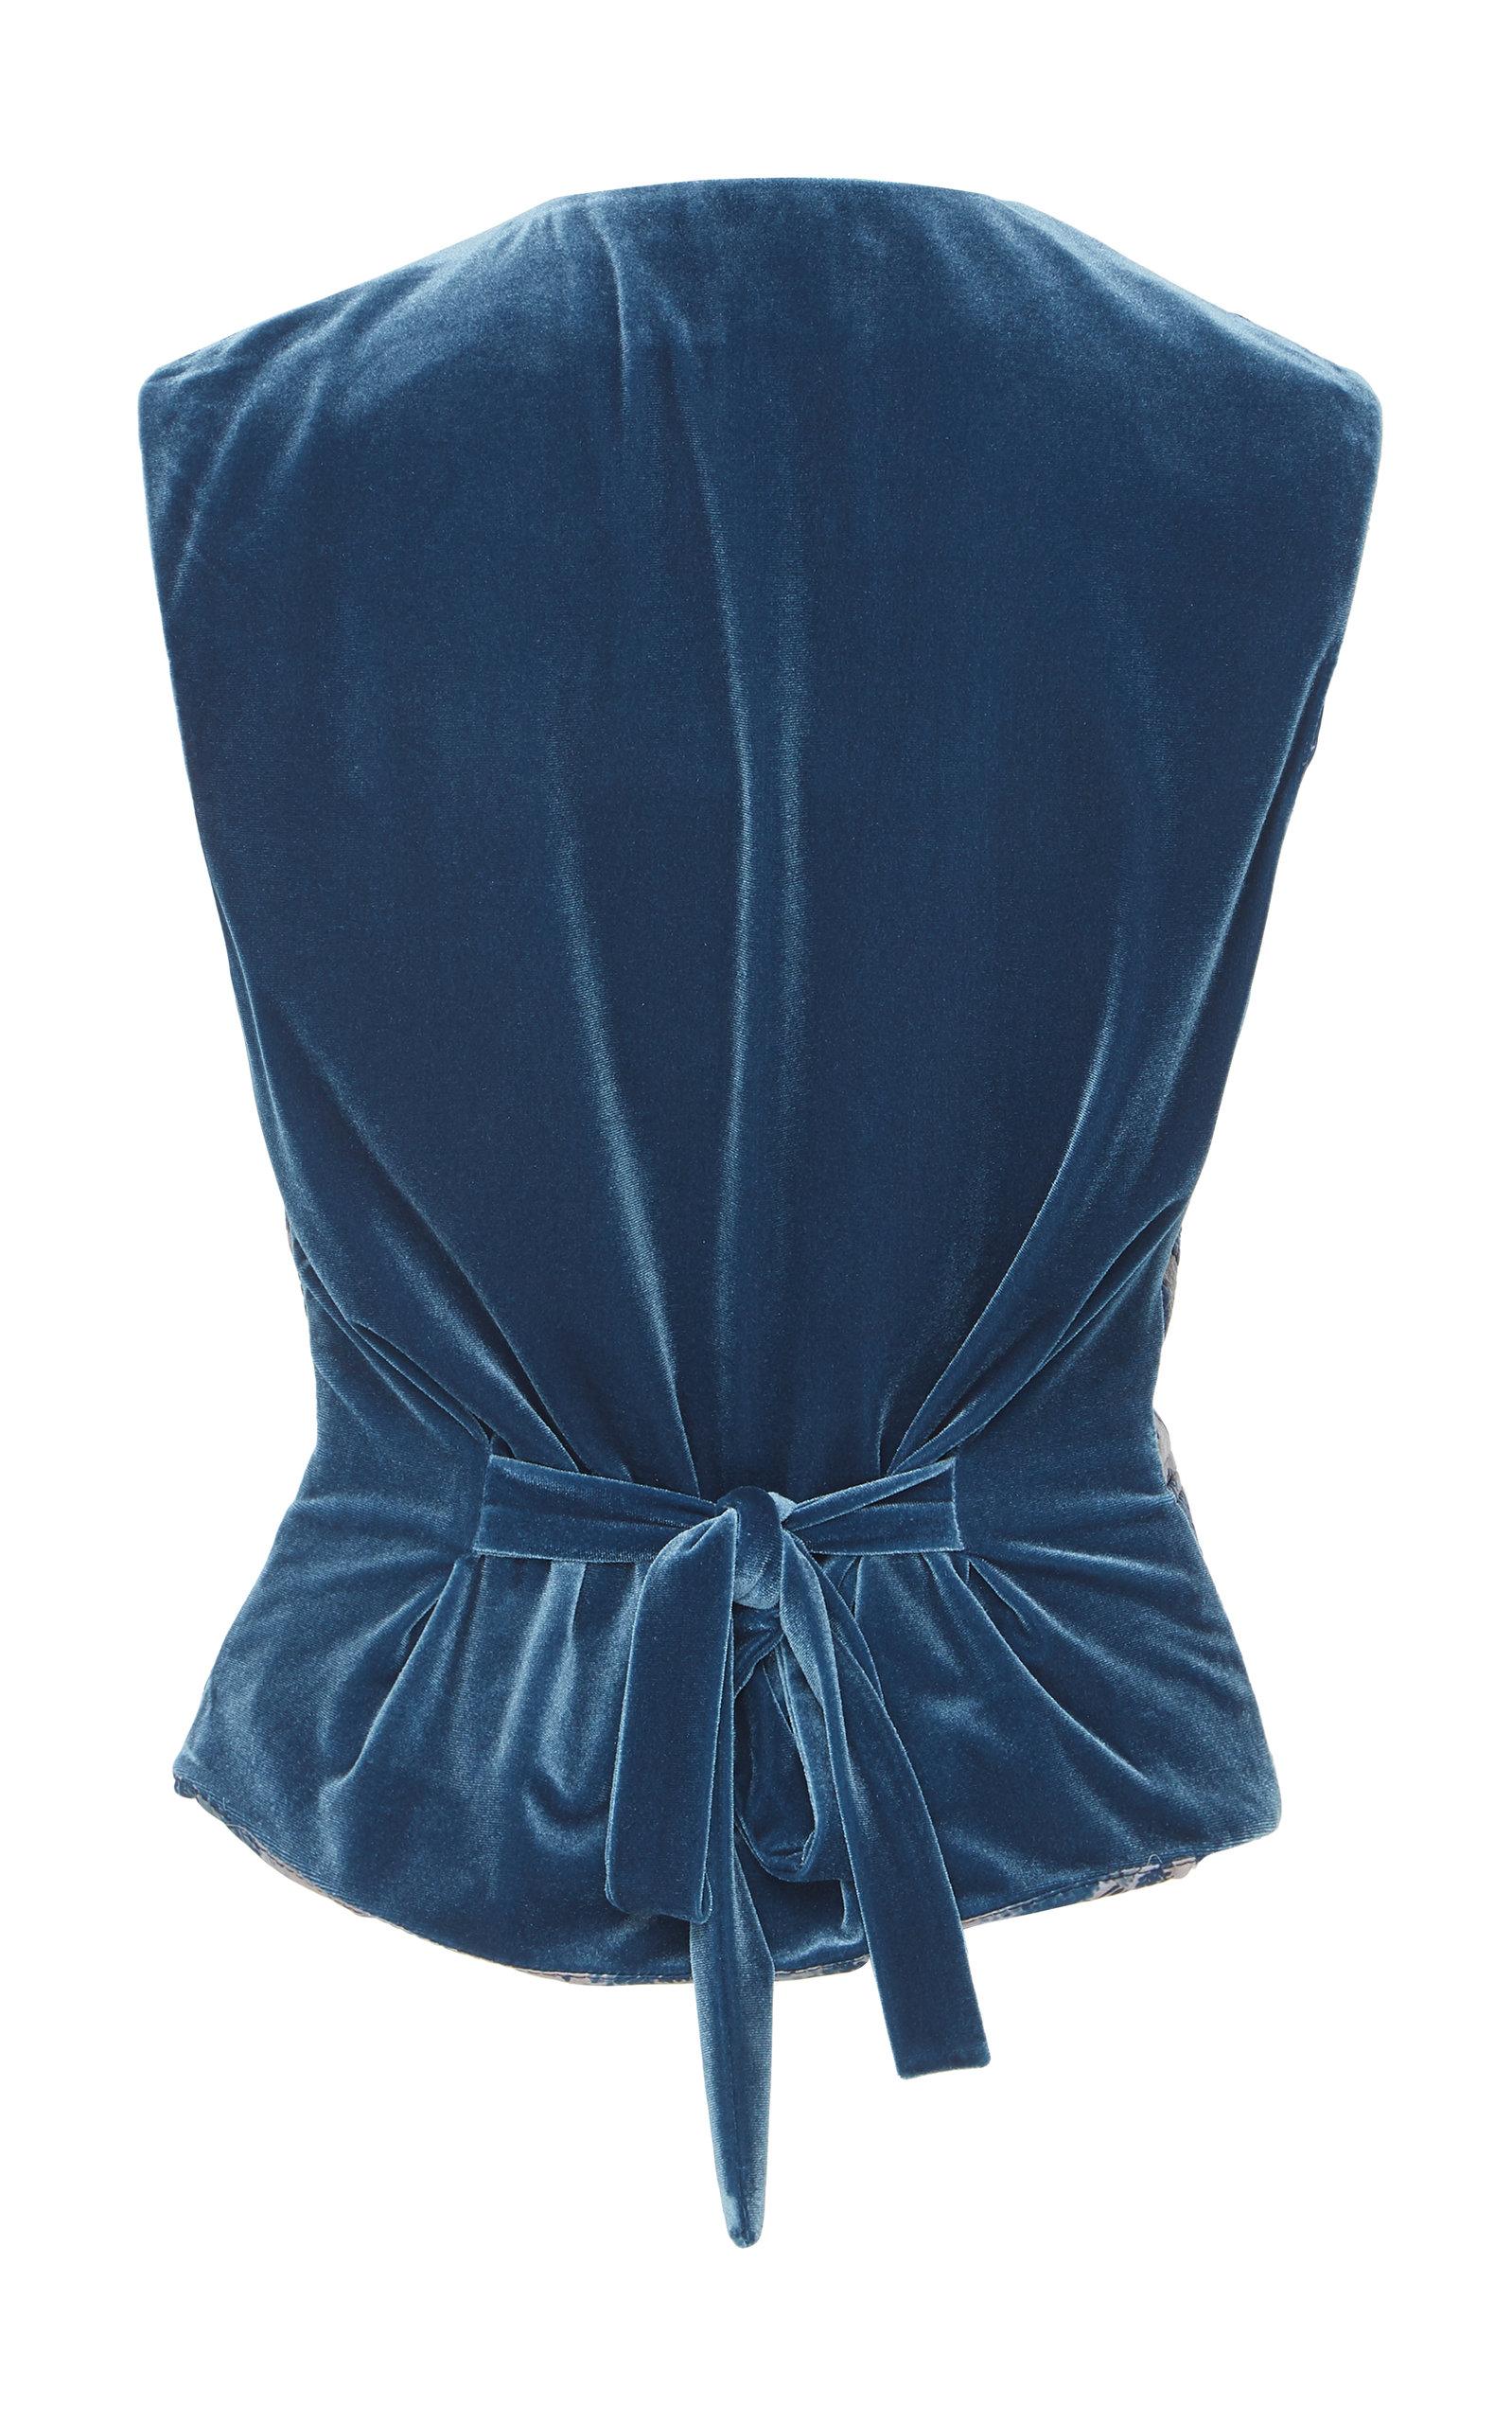 f8d7609d159 Luisa BeccariaFloral Jacquard Vest. CLOSE. Loading